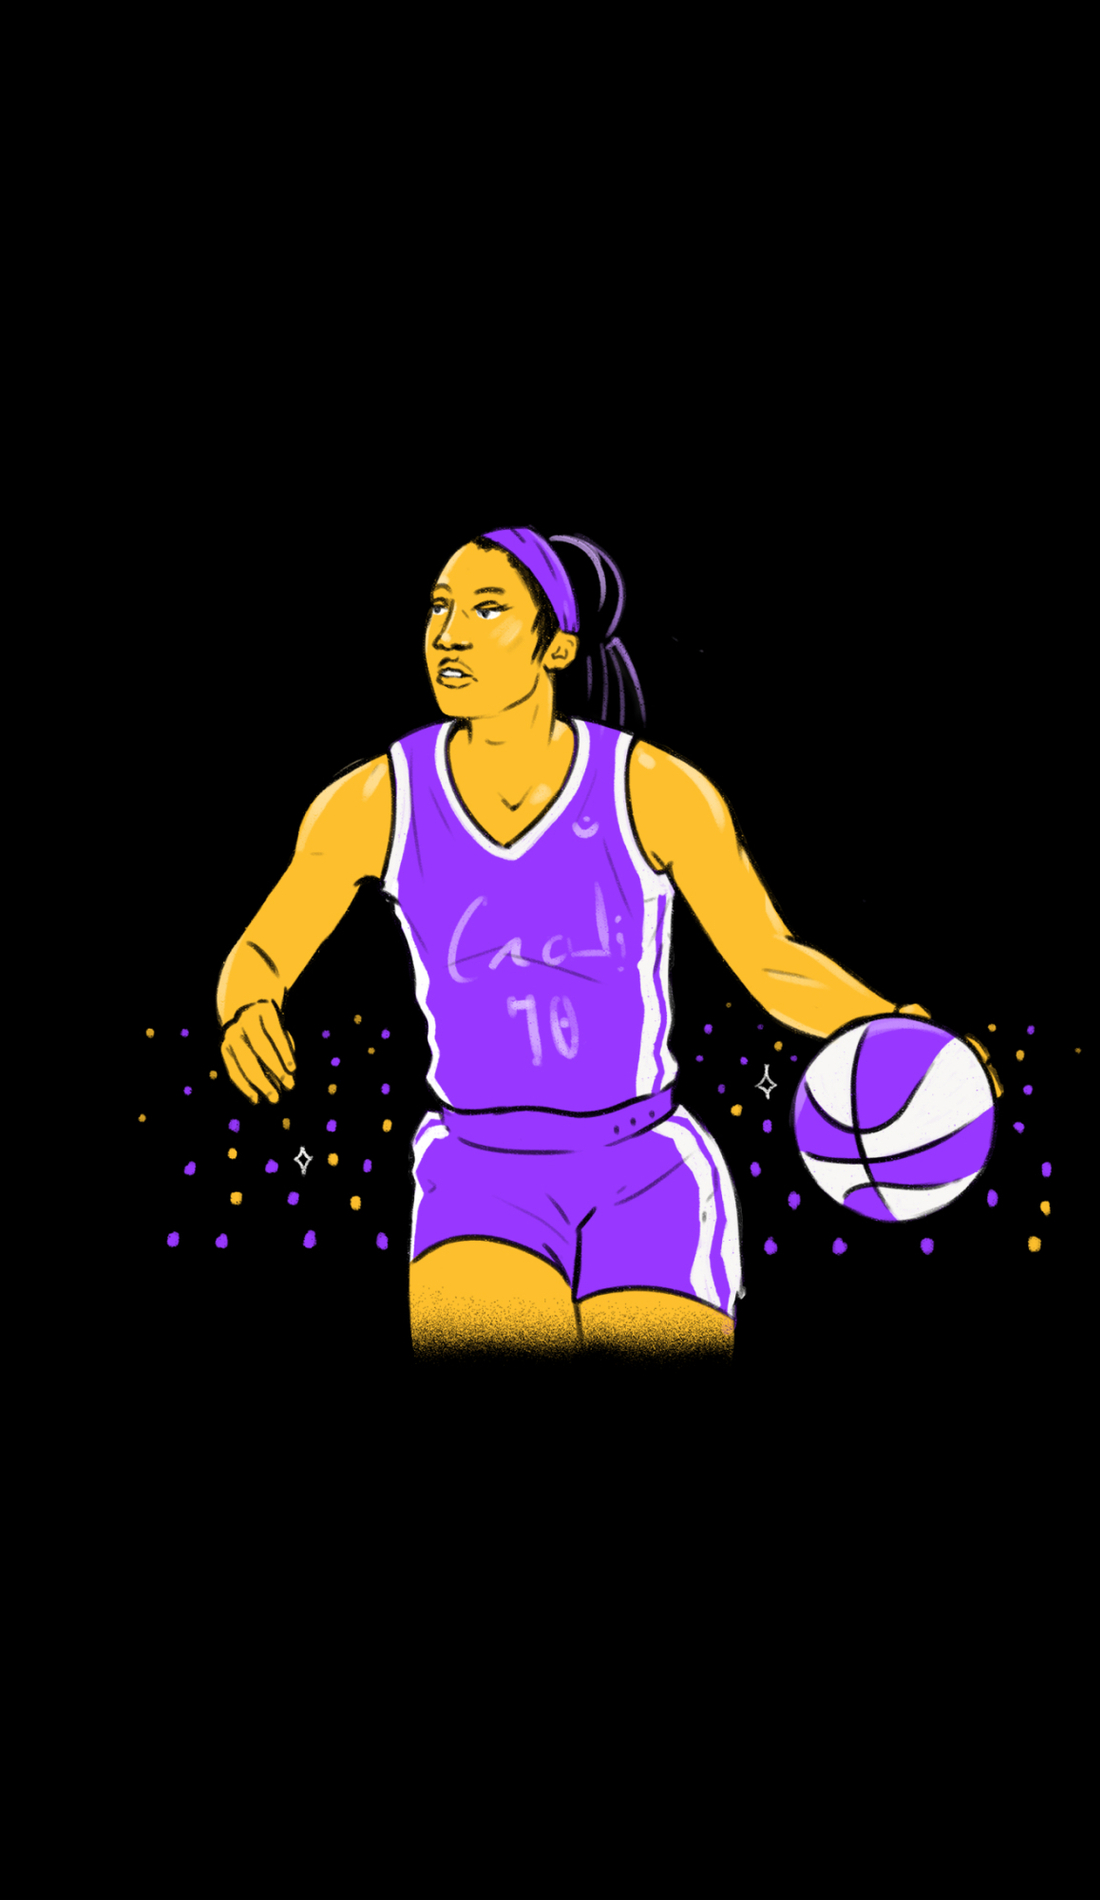 A James Madison Dukes Womens Basketball live event